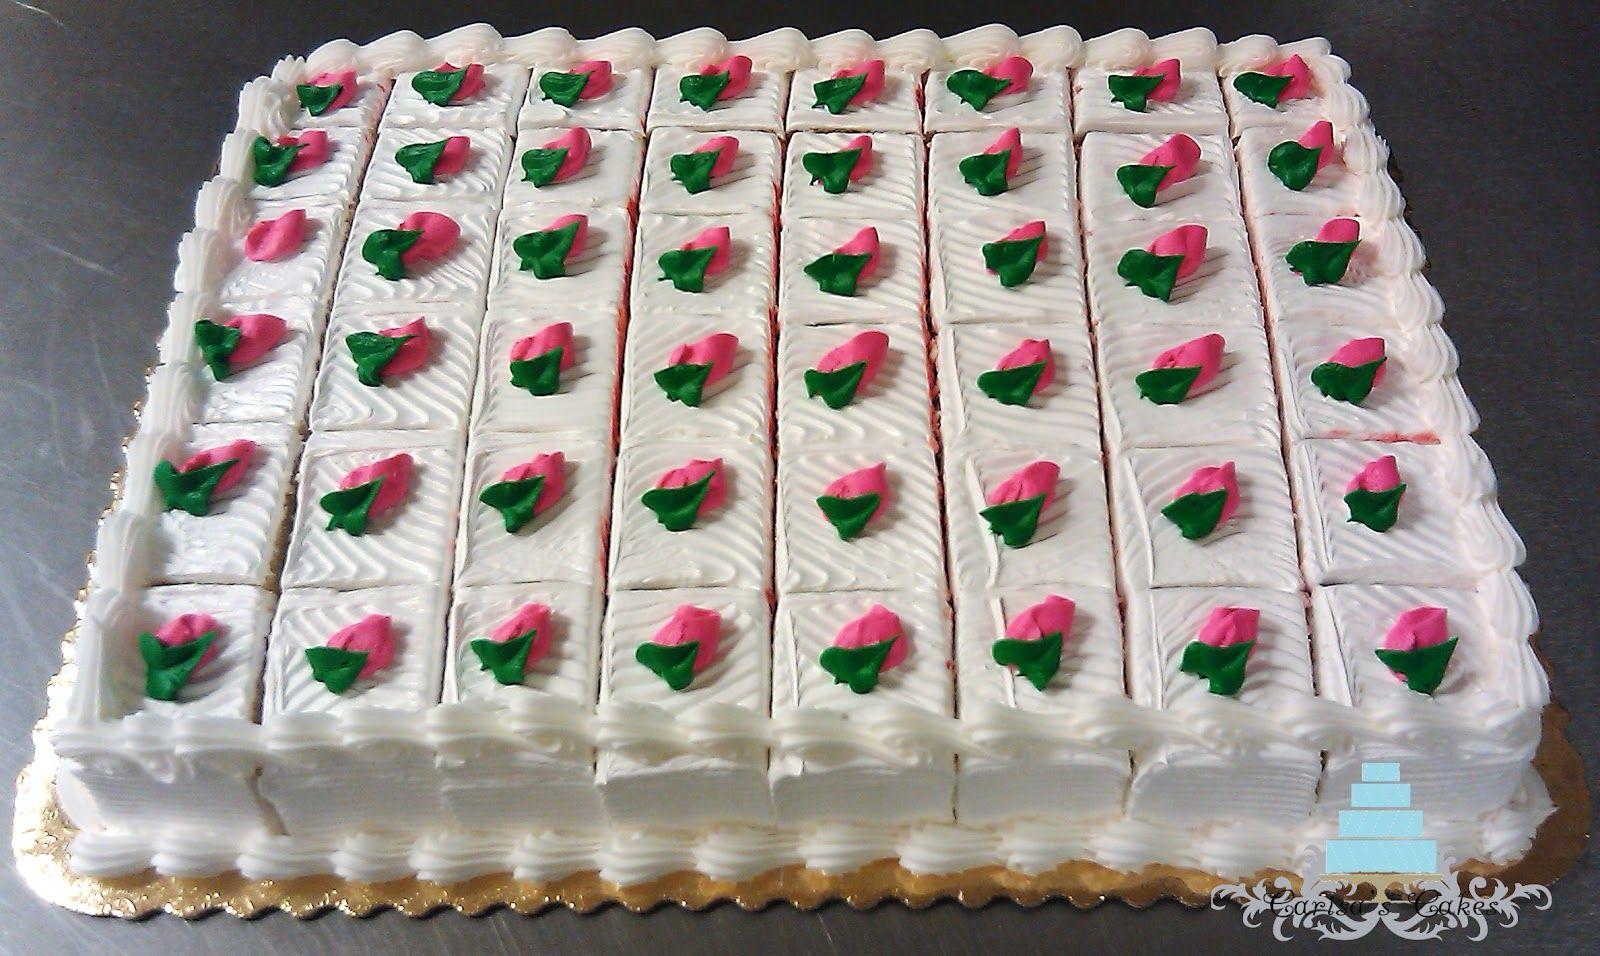 wedding sheet cakes sheetcake+scorededited.jpg Wedding